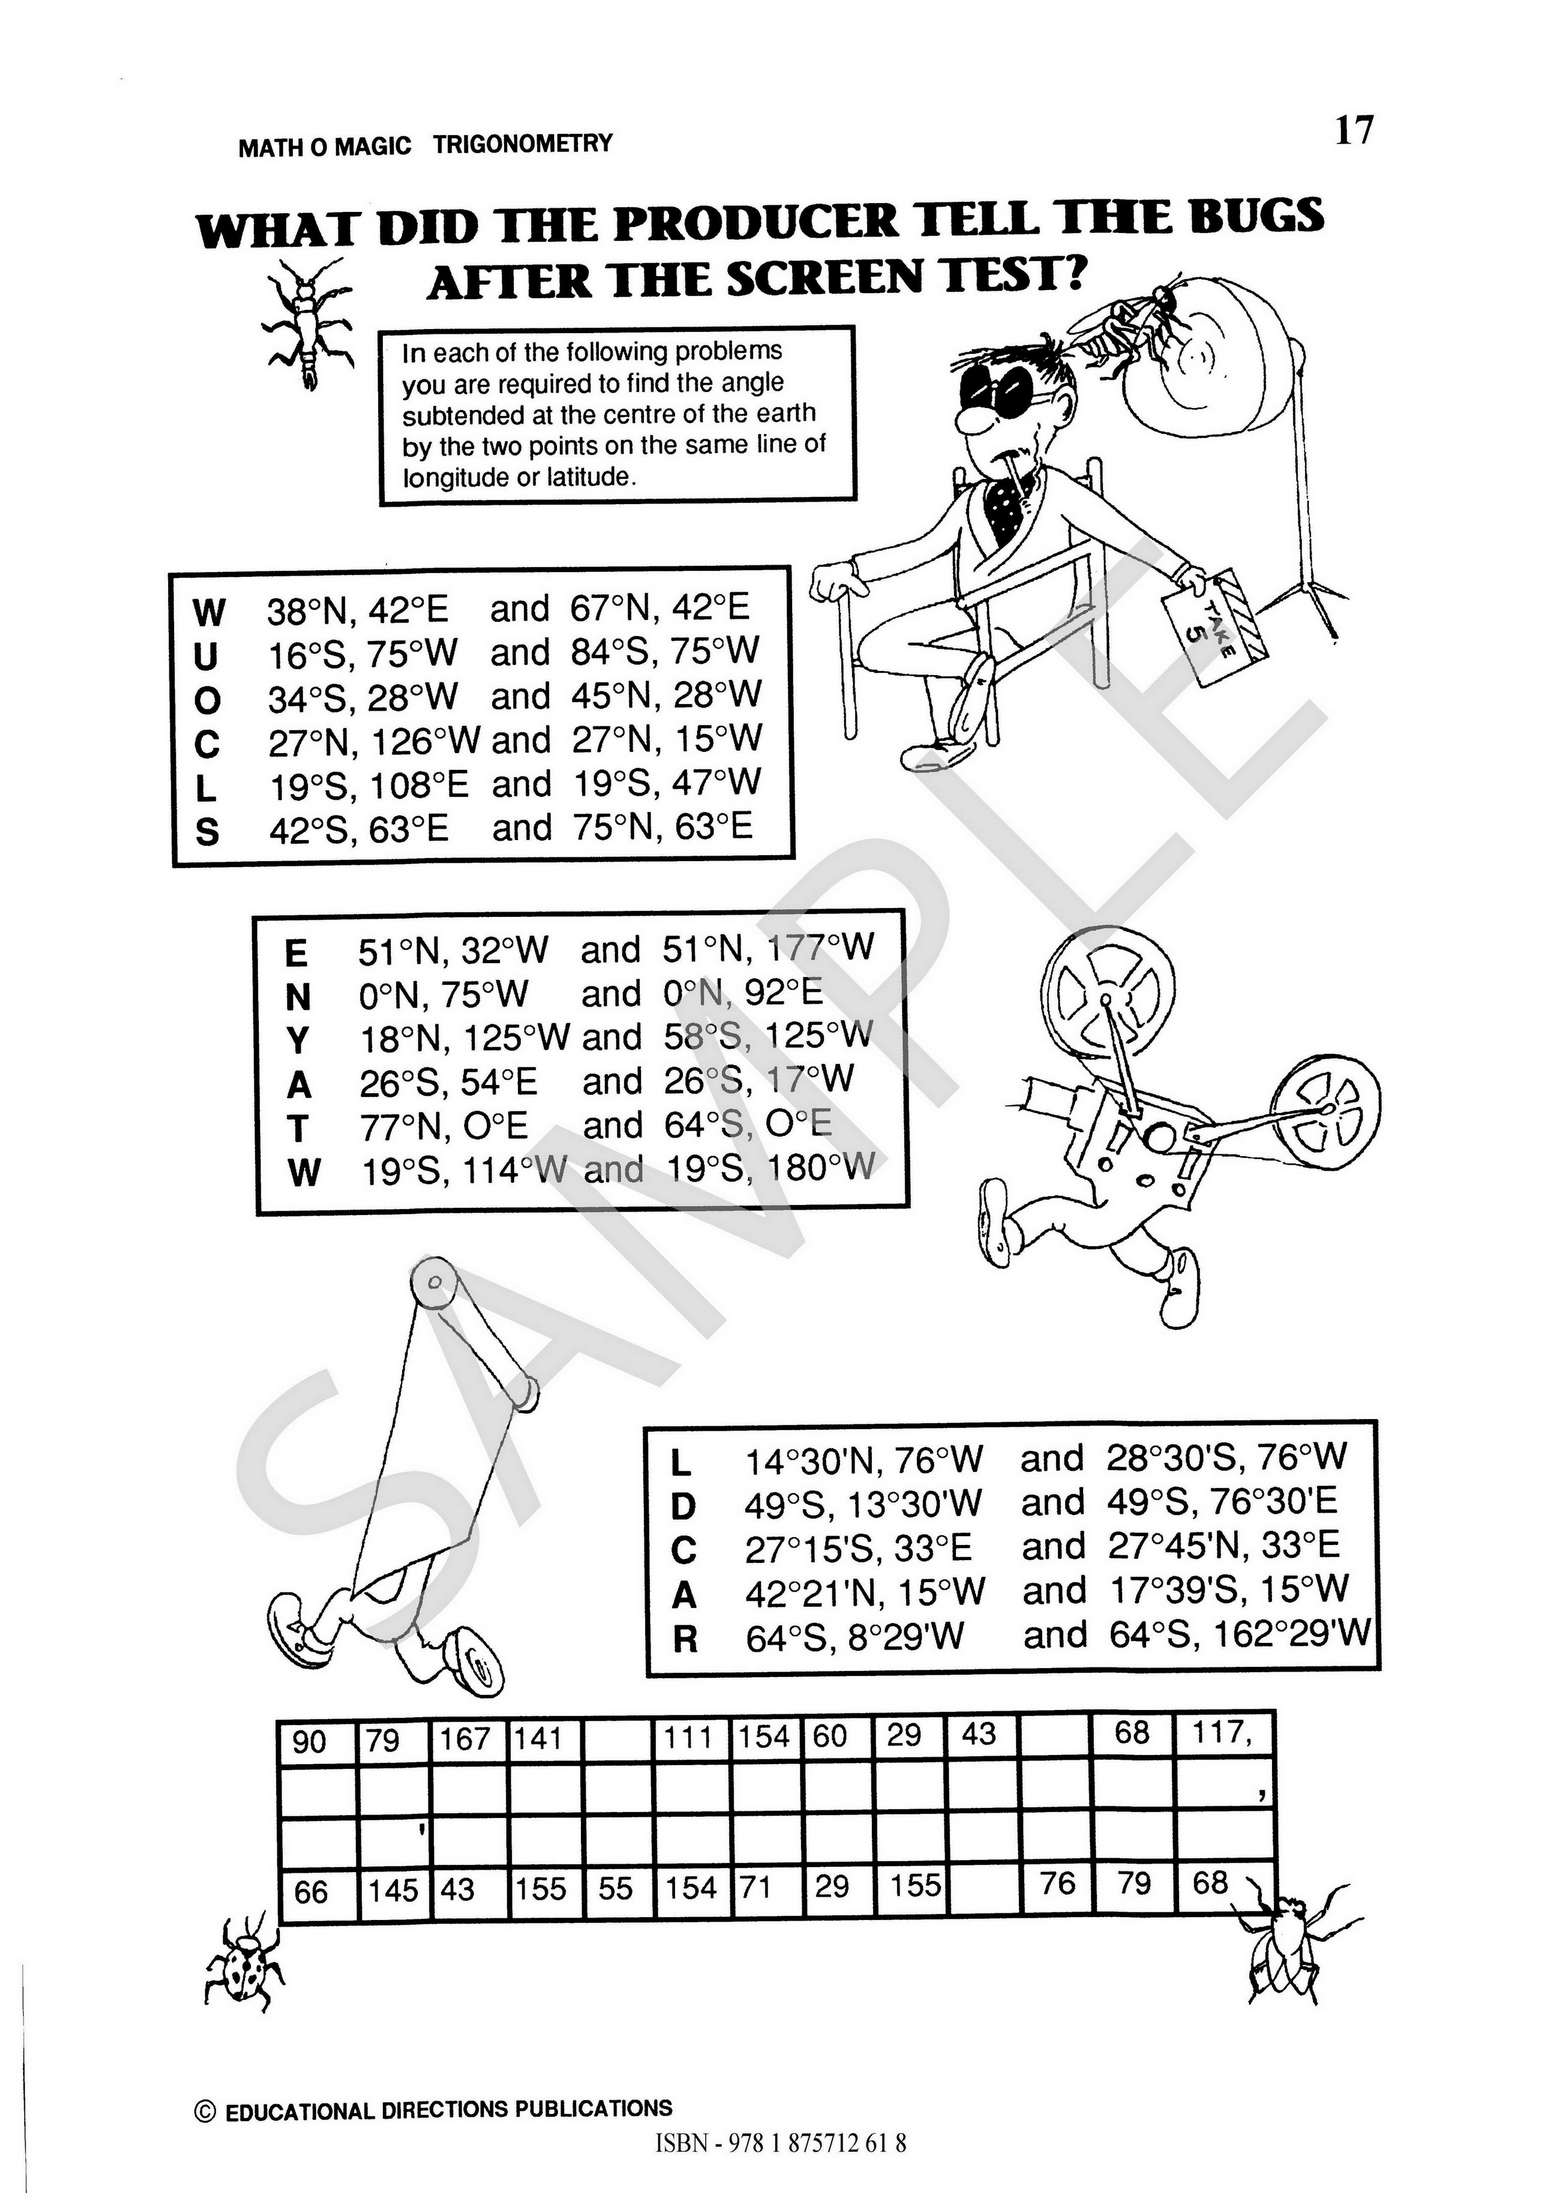 Math O Magic Trigonometry Ed Publications